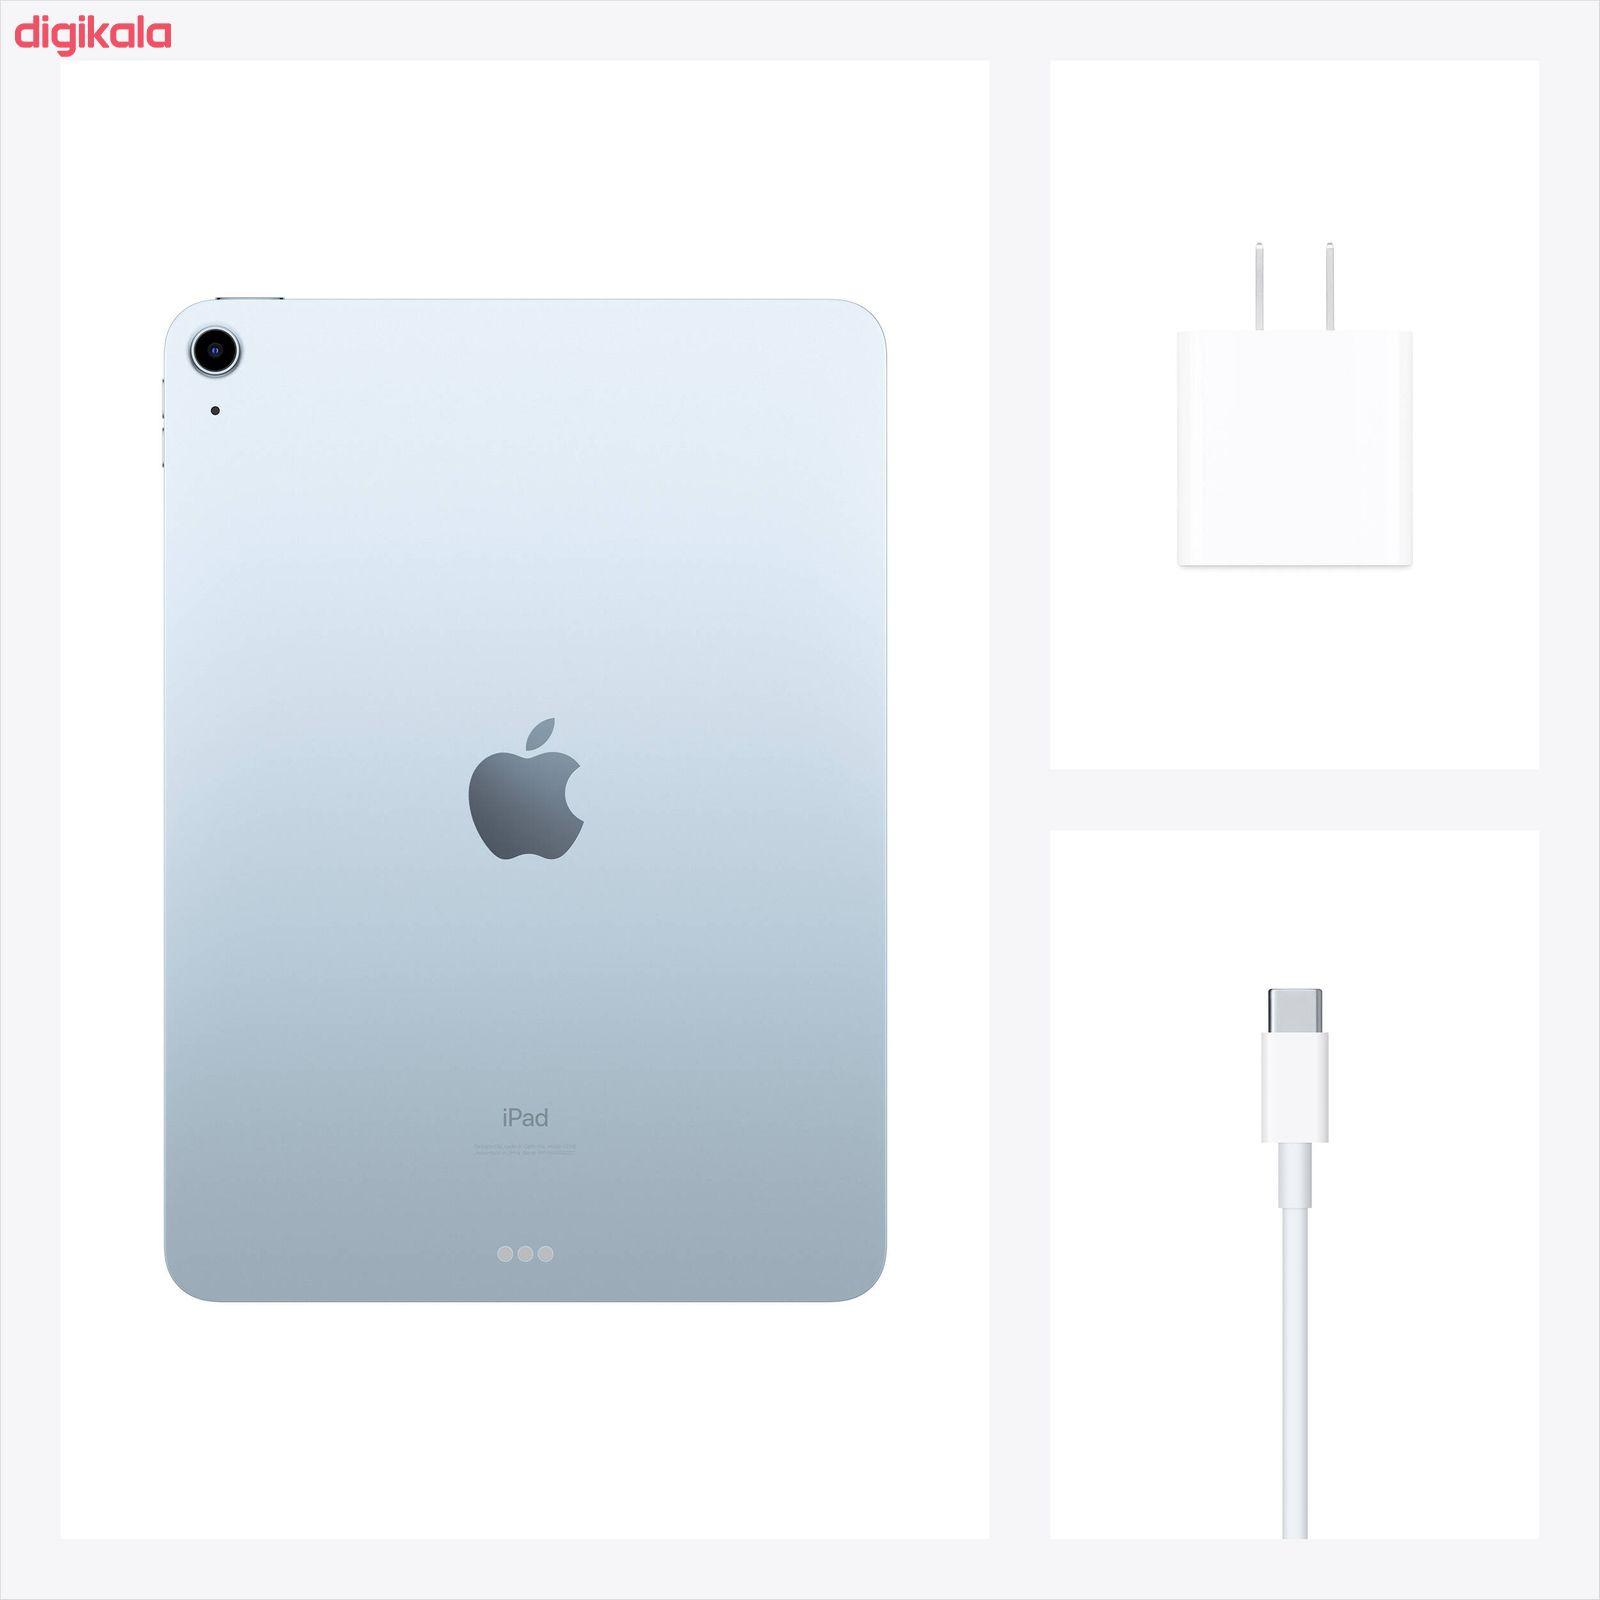 تبلت اپل مدل iPad Air 10.9 inch 2020 WiFi ظرفیت 256 گیگابایت  main 1 3